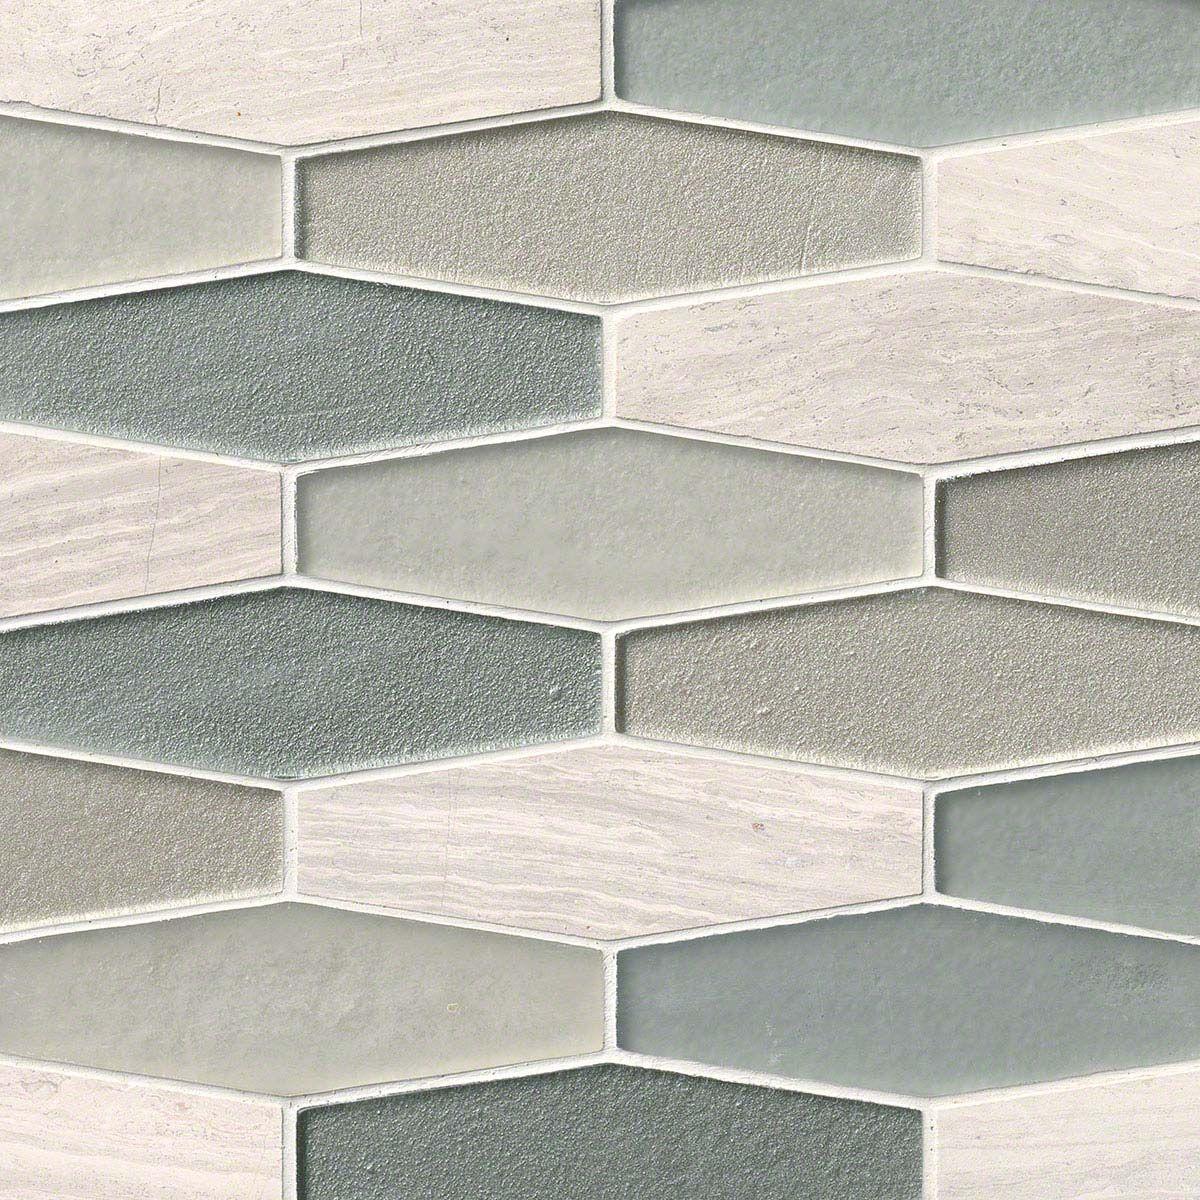 Europa Elongated Hexagon 8mm Mosaics Tile Backsplash Stone